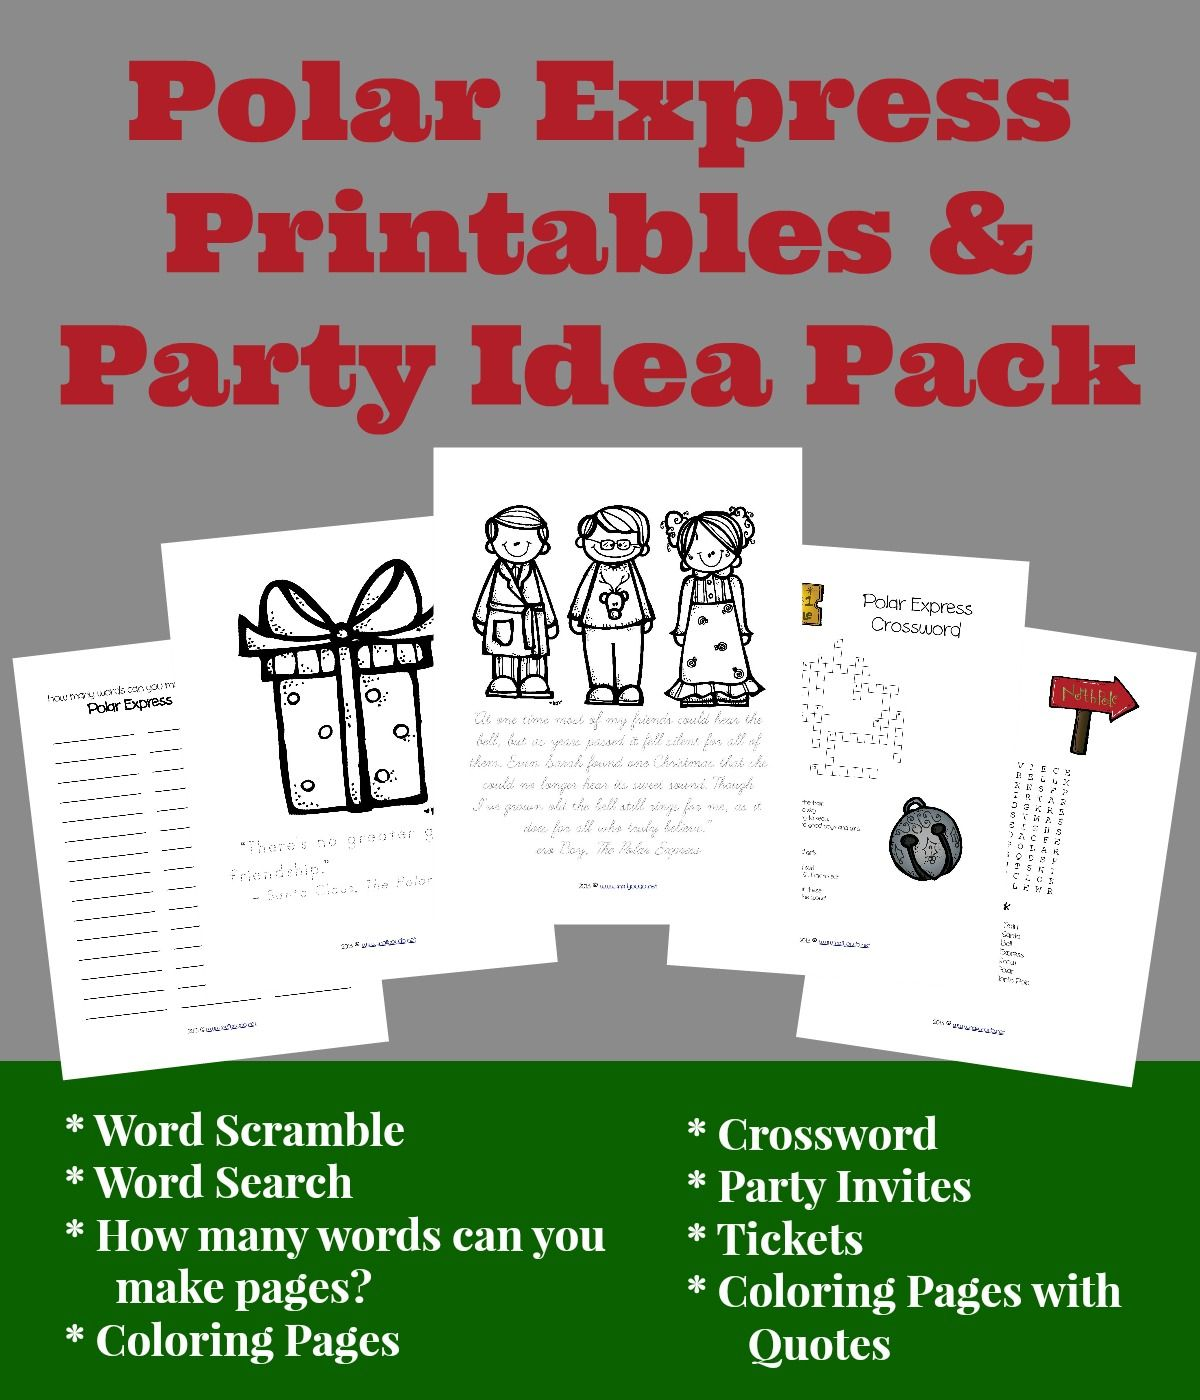 Polar Express Party Pack Printables Ideas